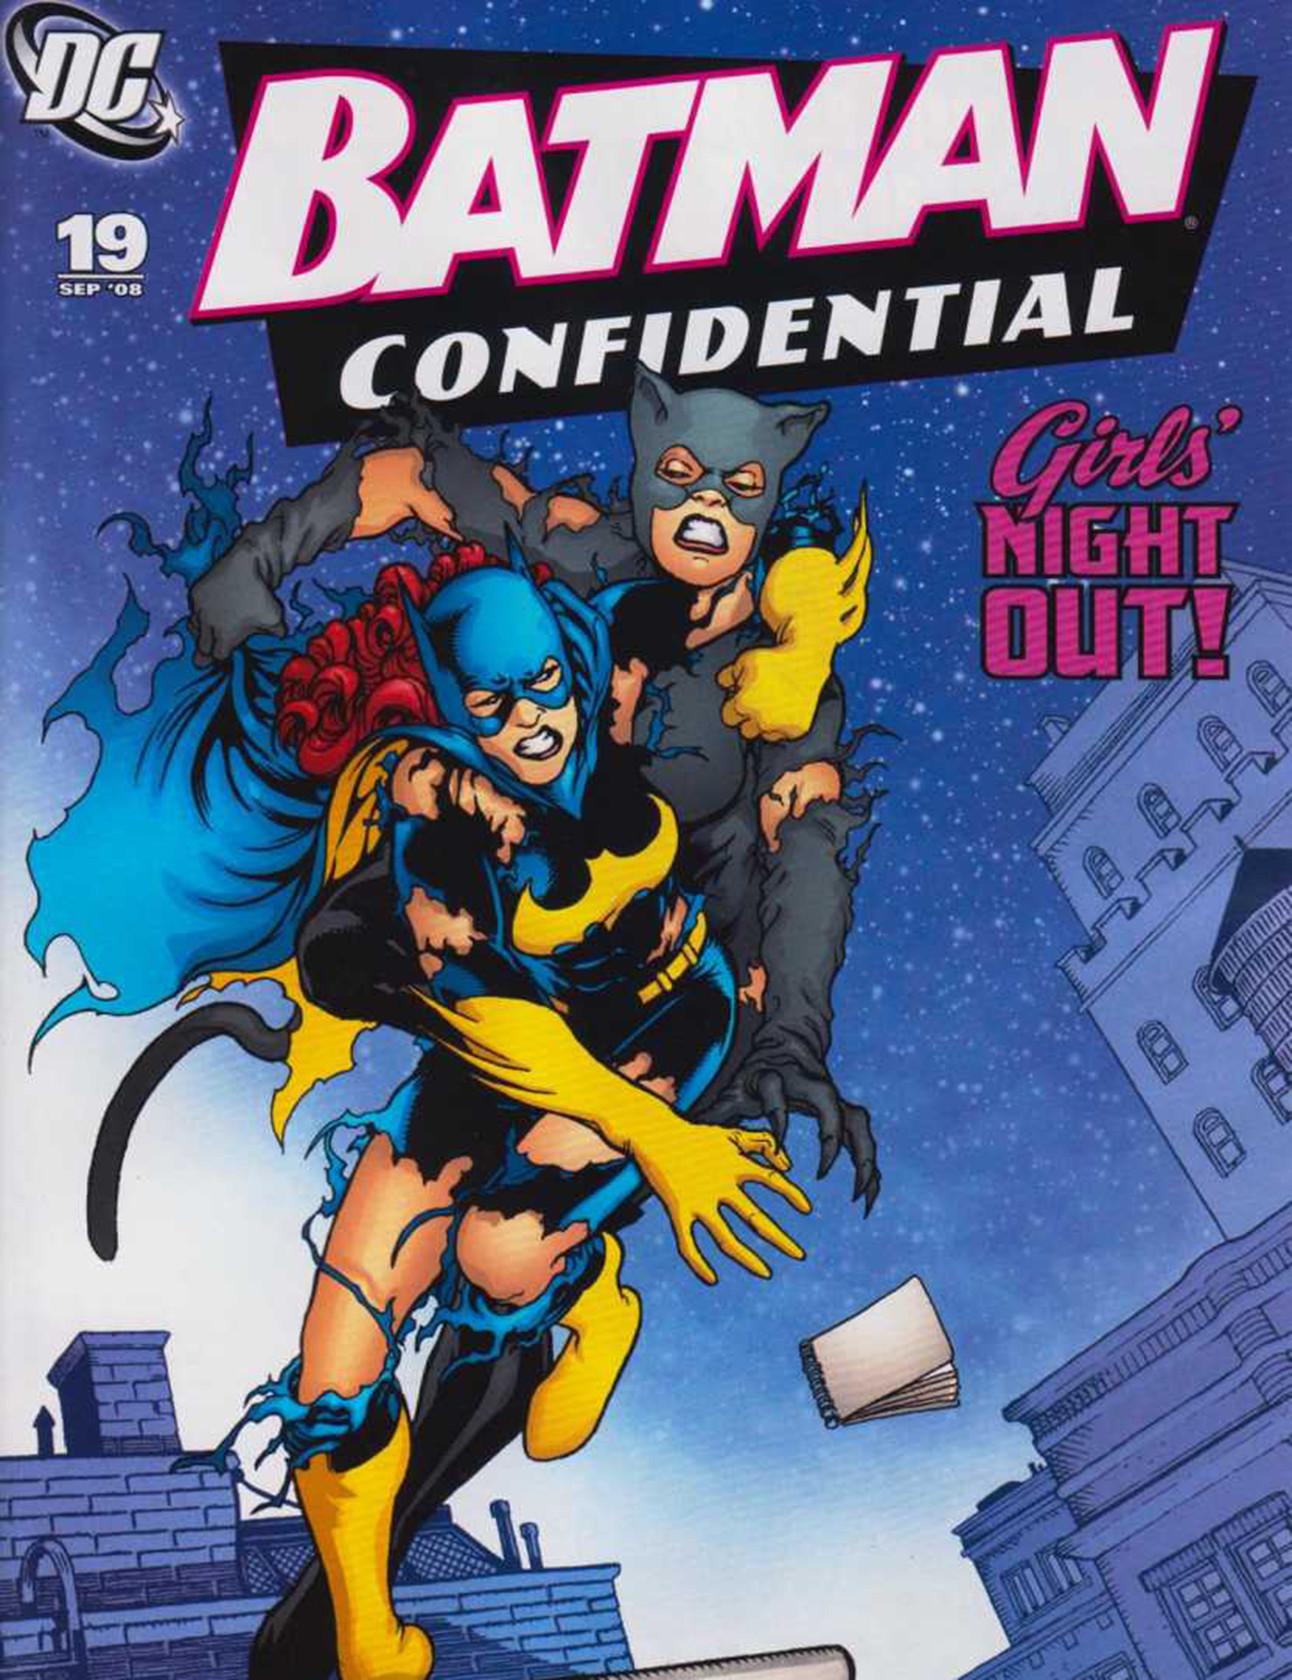 BatmanConfidential.jpg